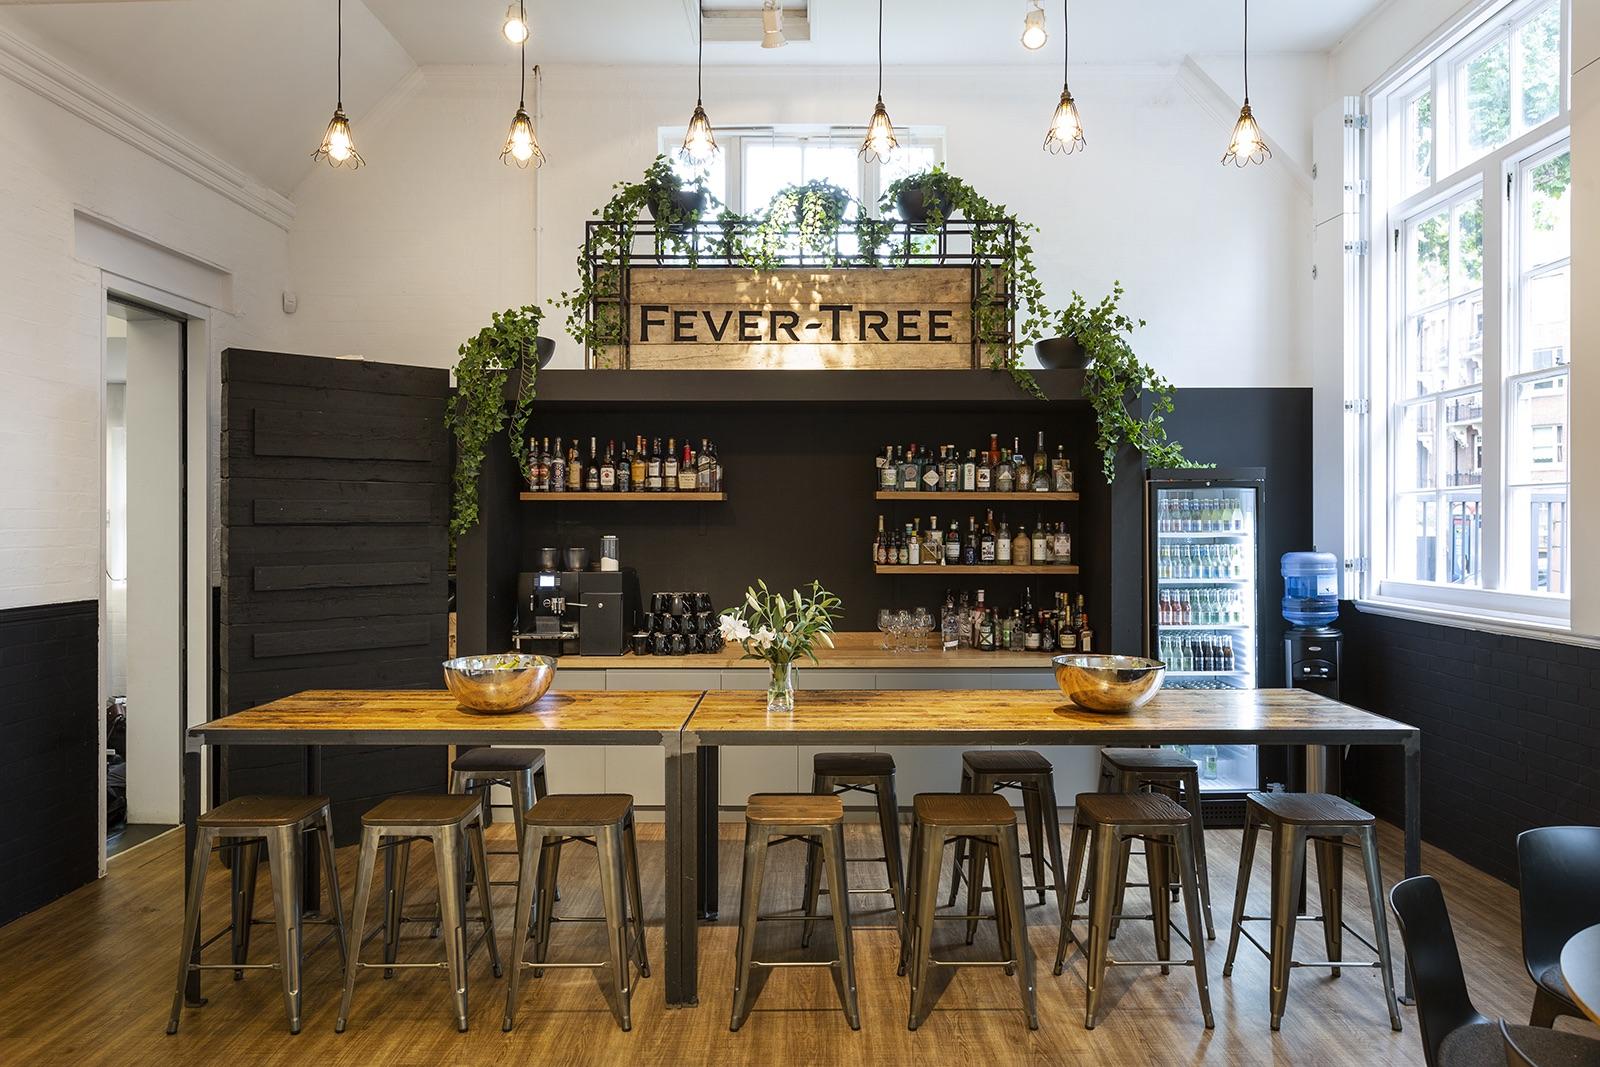 fevertree-office-london-7